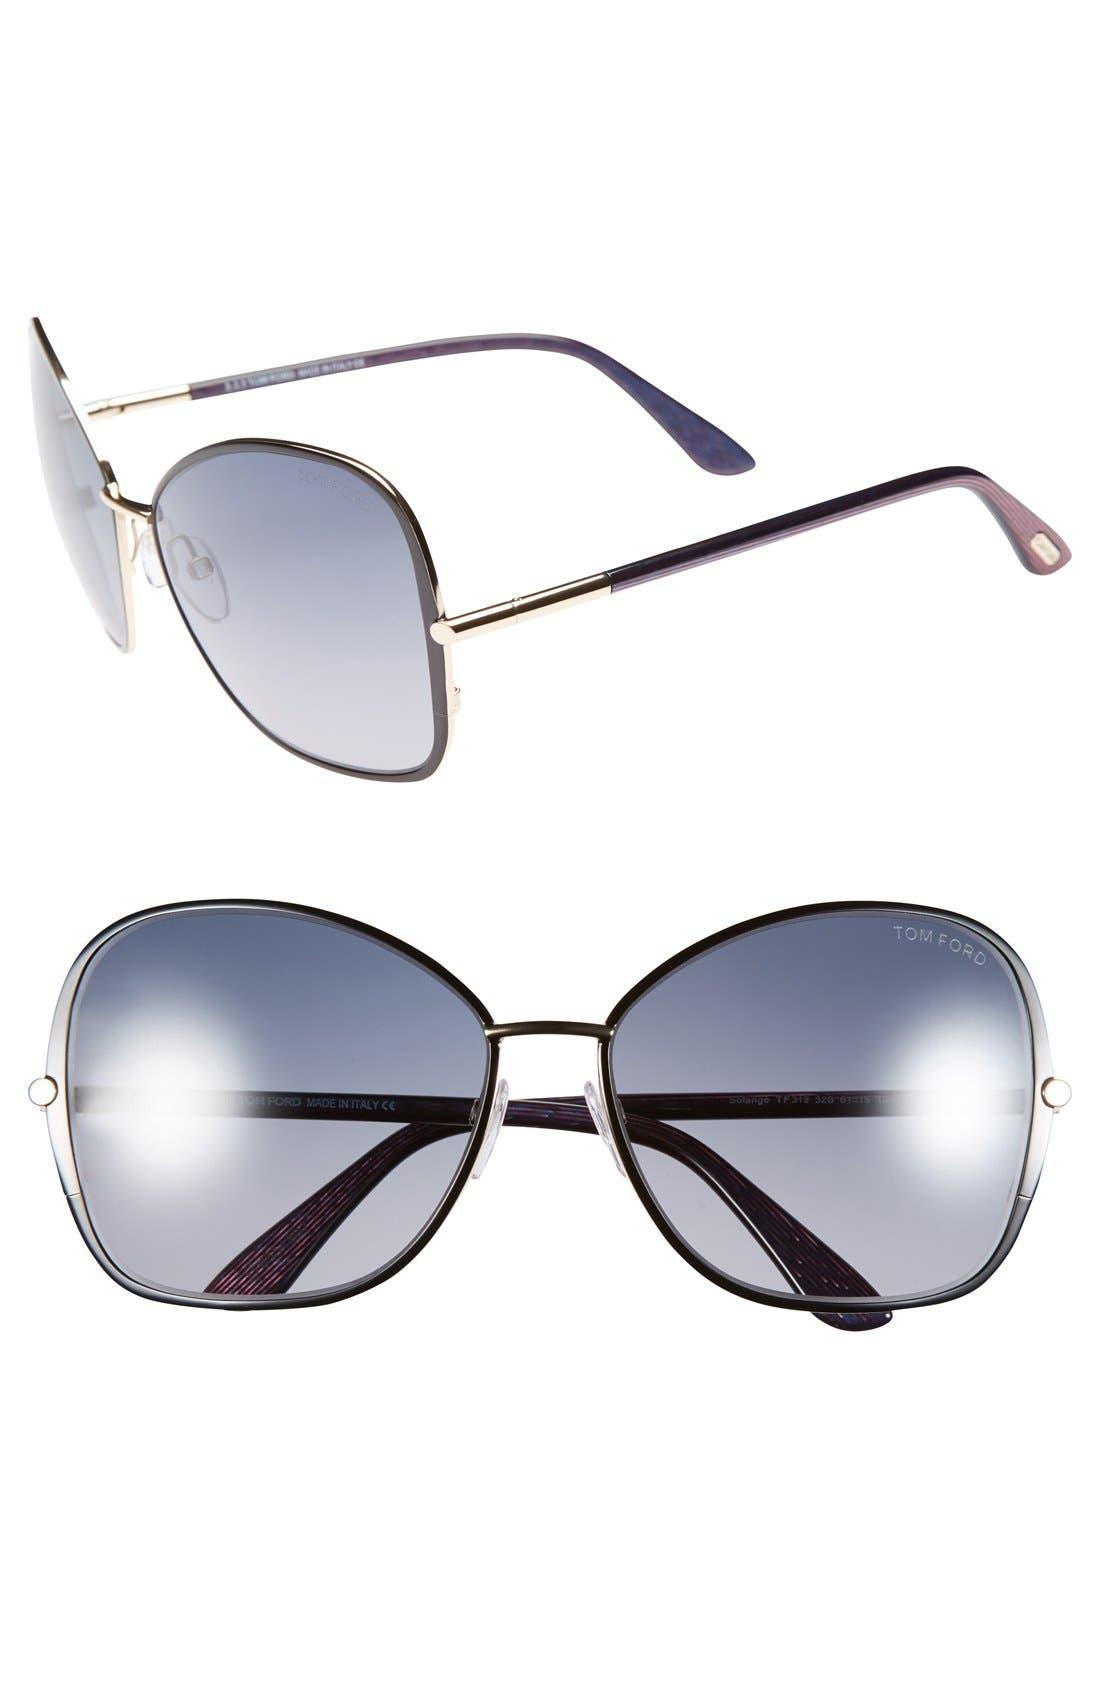 Main Image - Tom Ford 'Solange' 61mm Sunglasses (Regular Retail Price: $405.00)